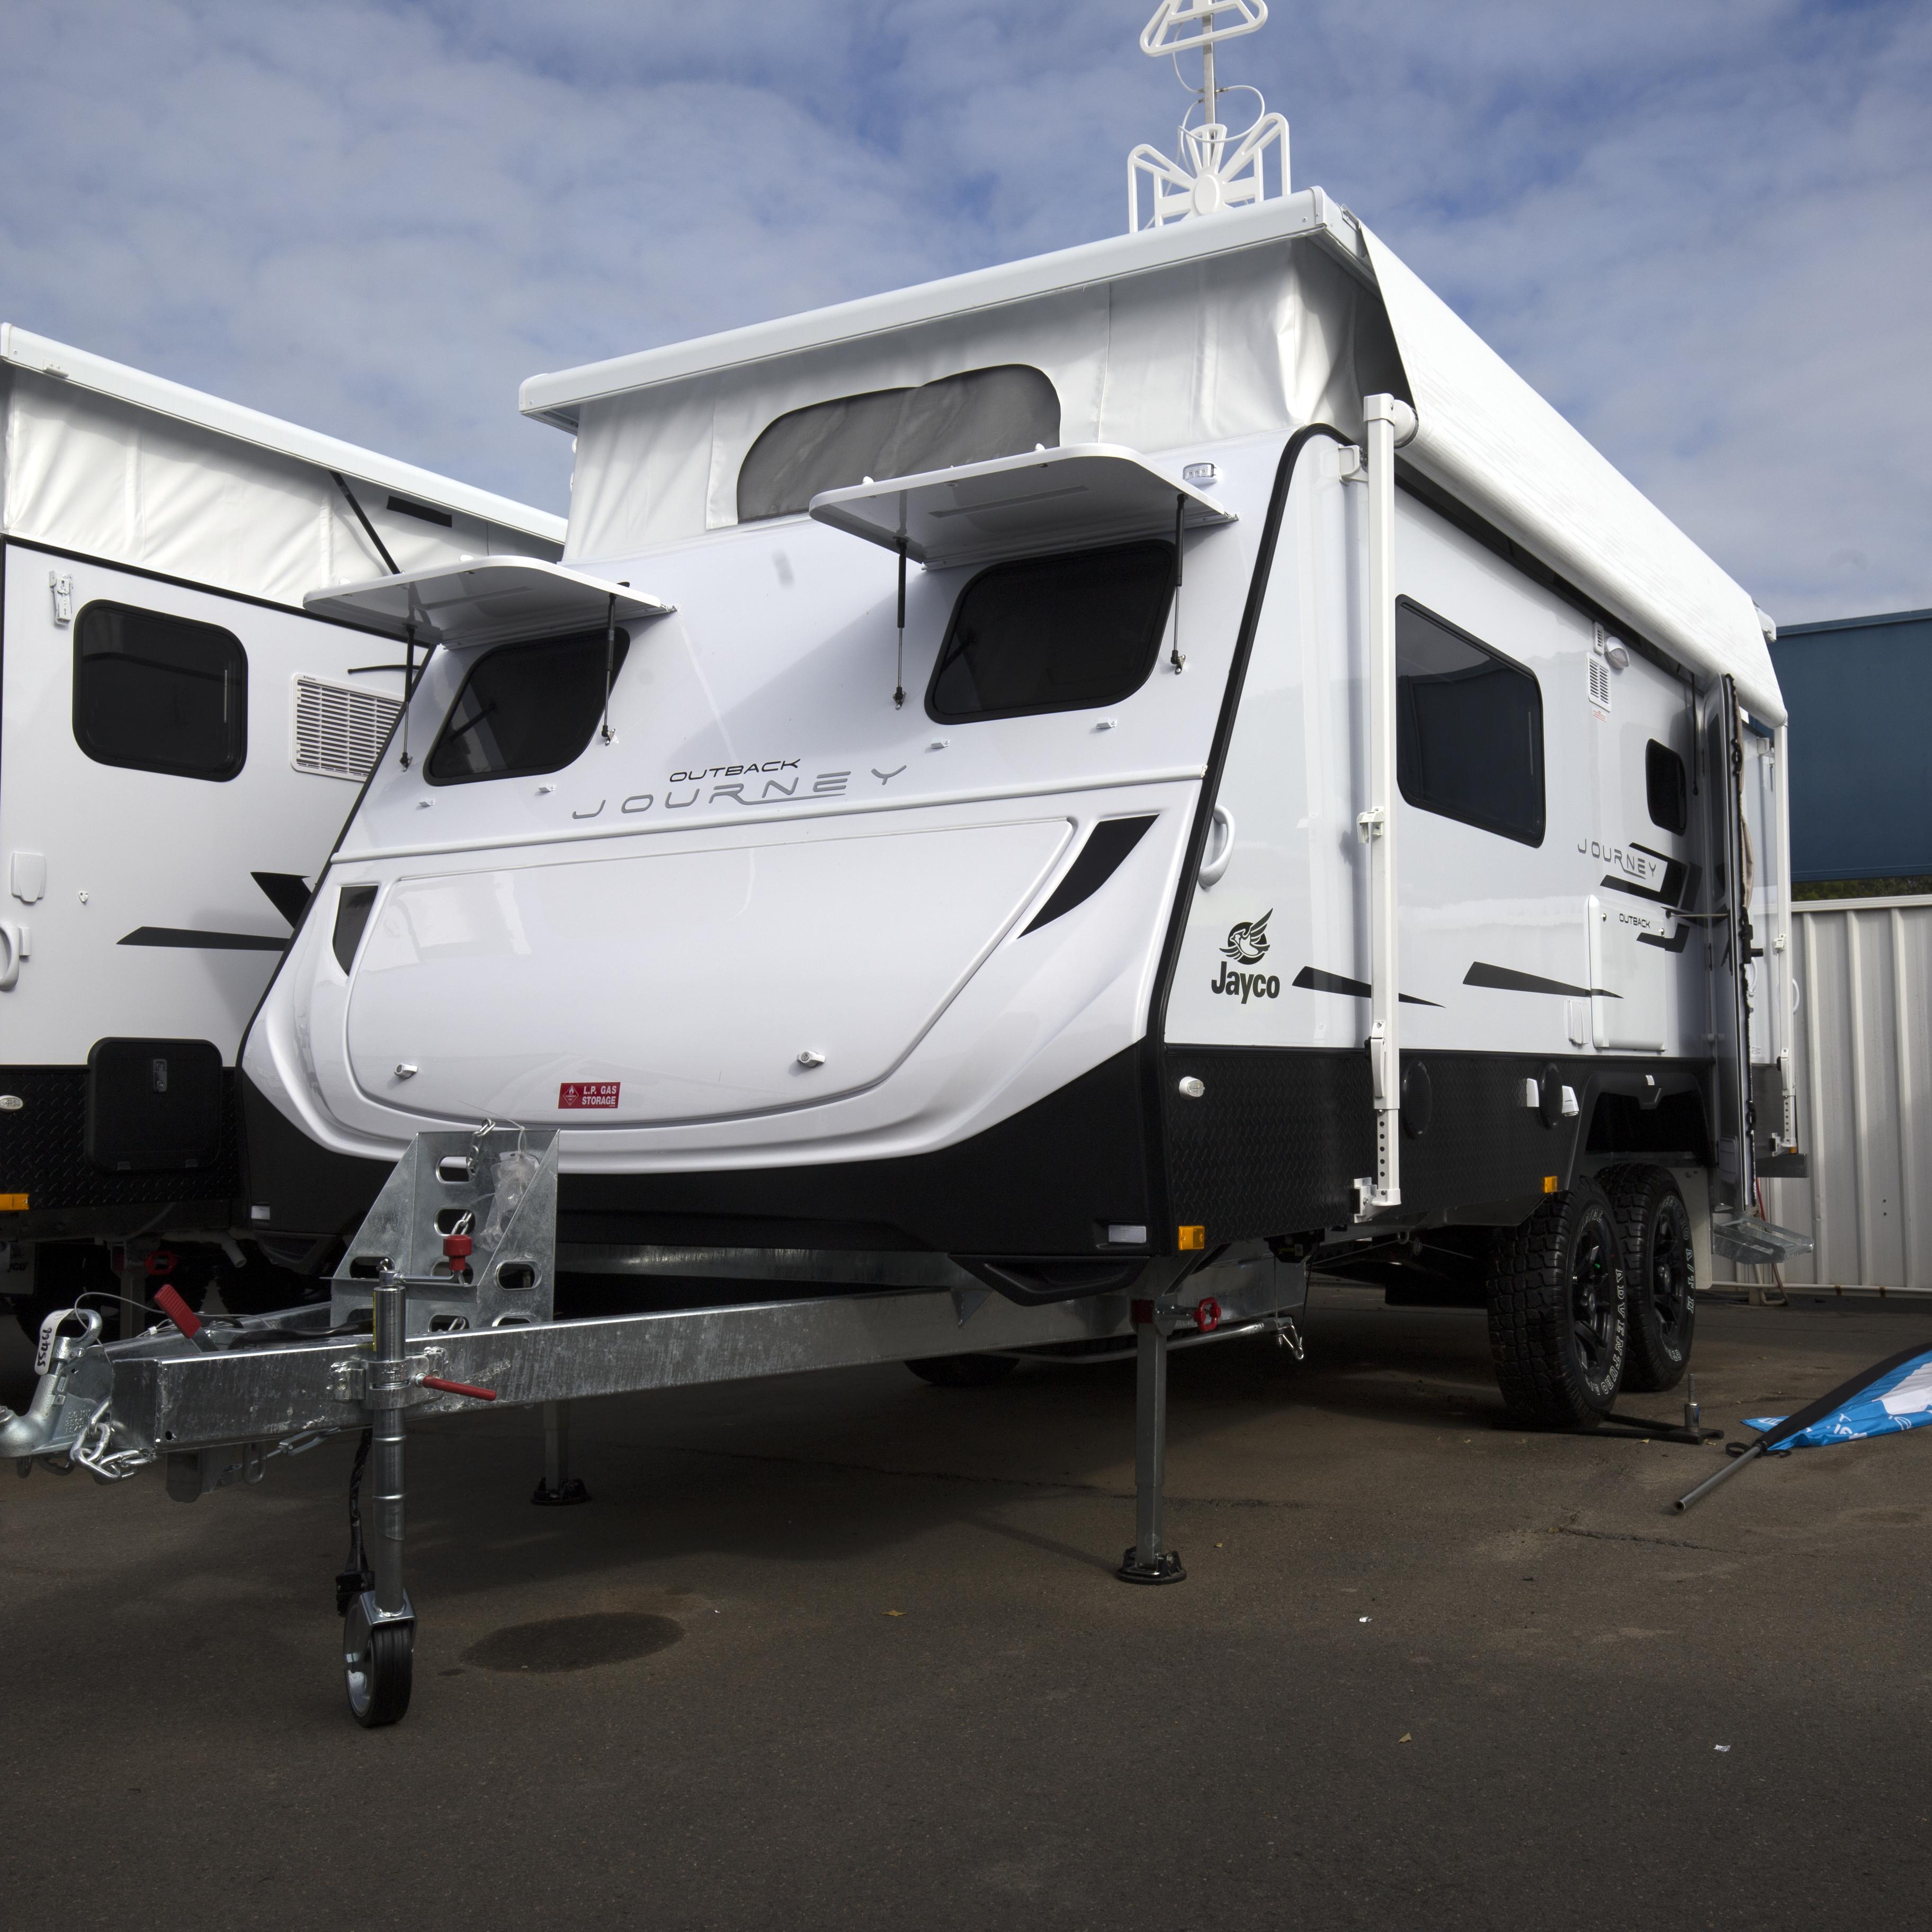 Win a brand new Jayco Caravan!